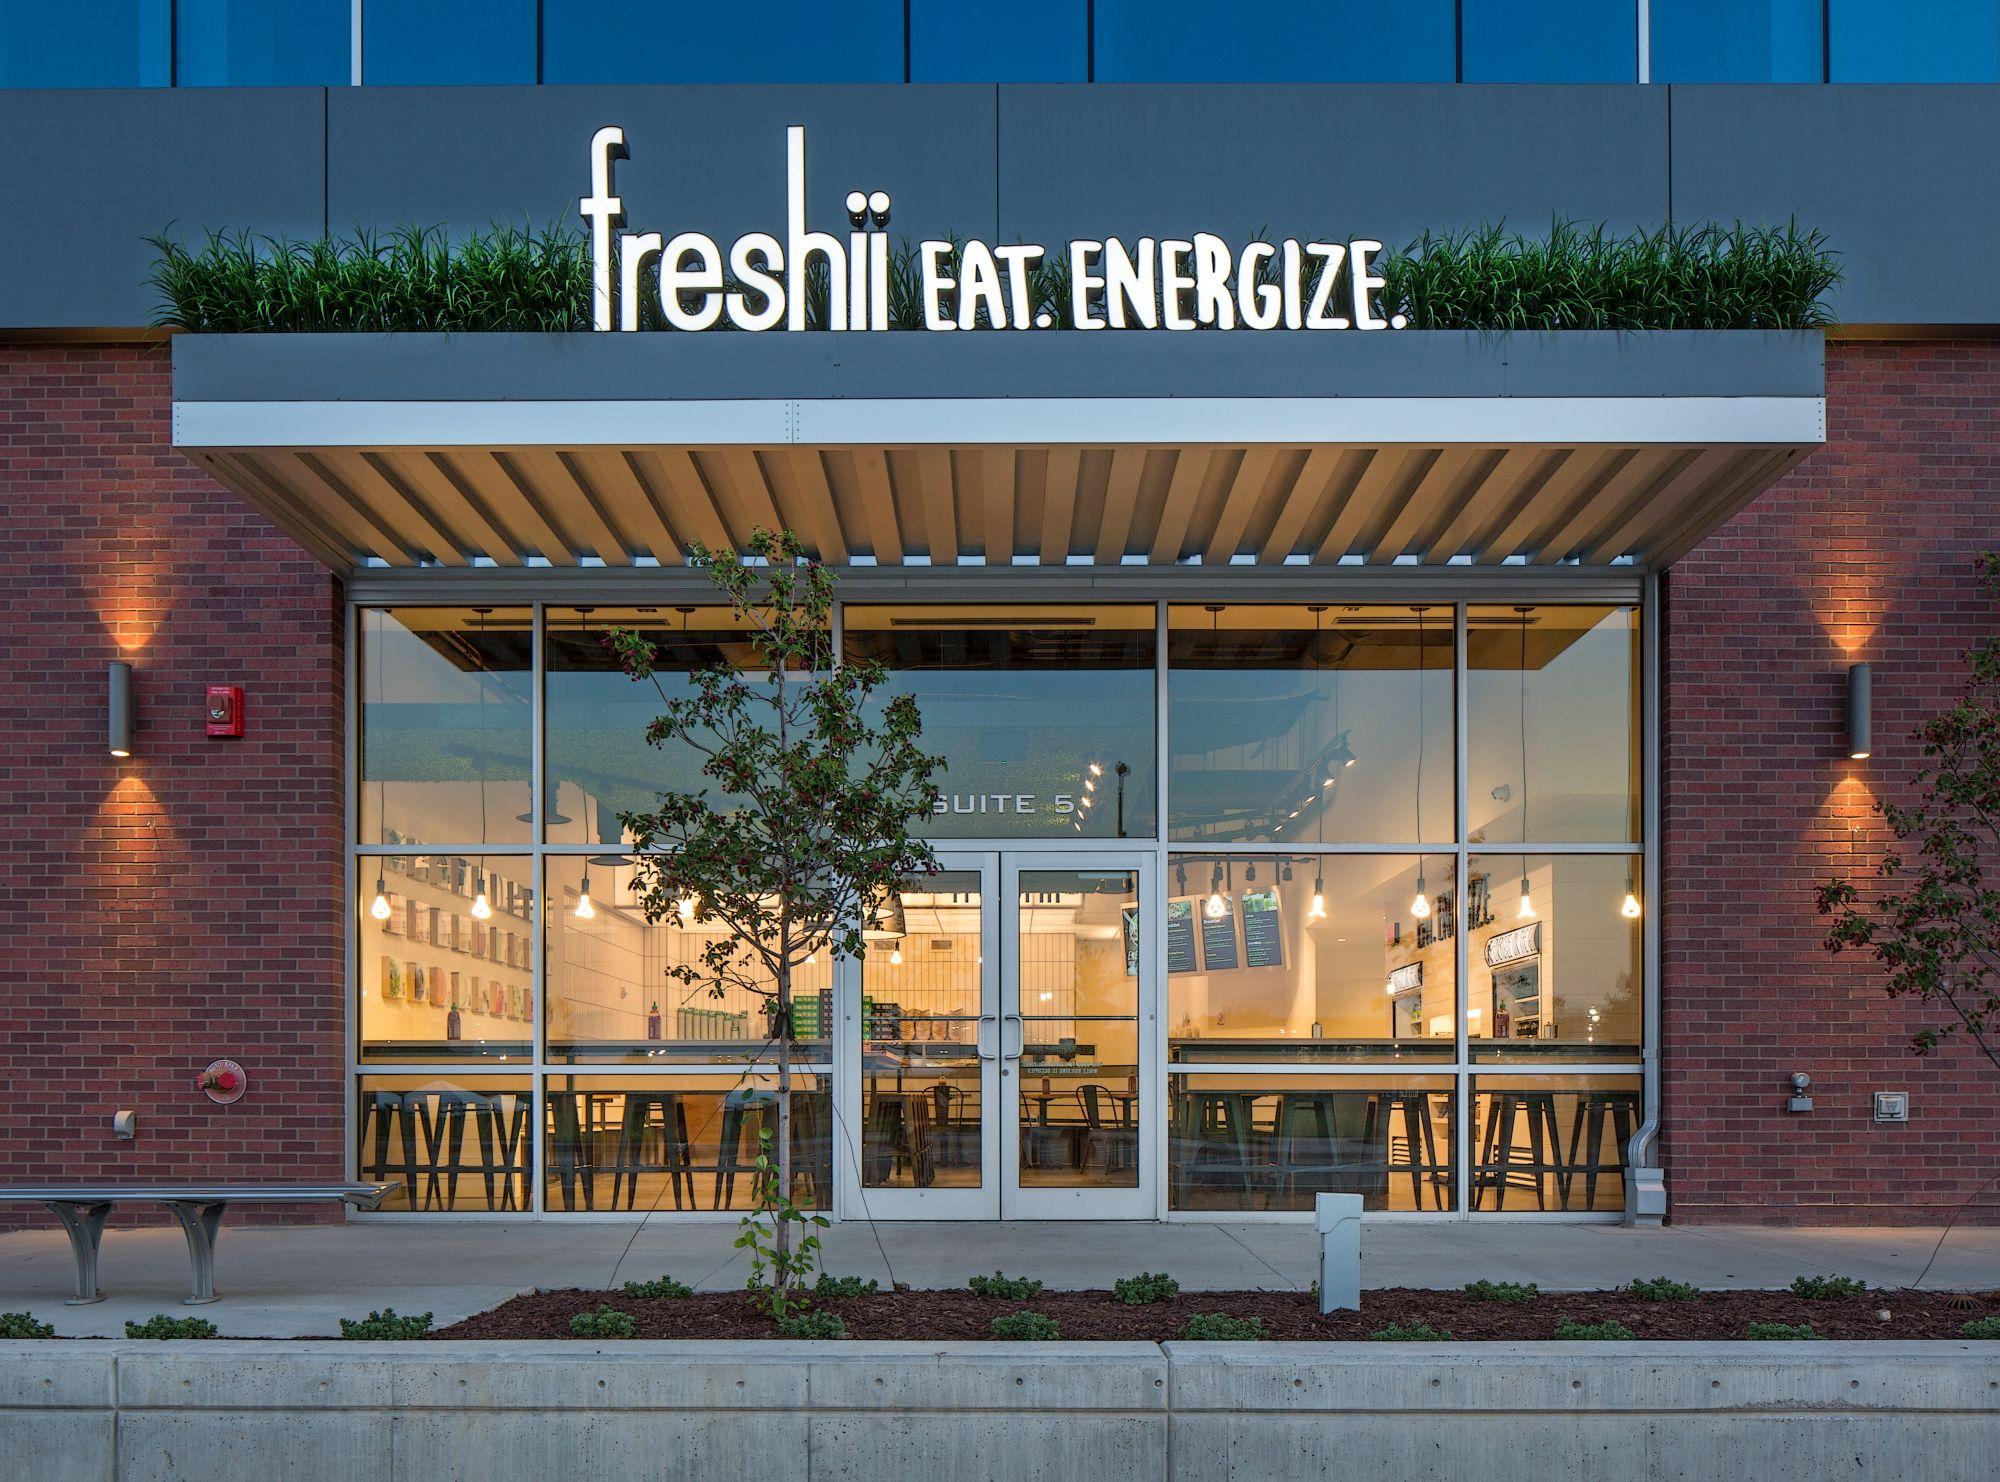 Attractive Store Design · Freshii Restaurant_Omaha_Cool Exterior Signage_Grass